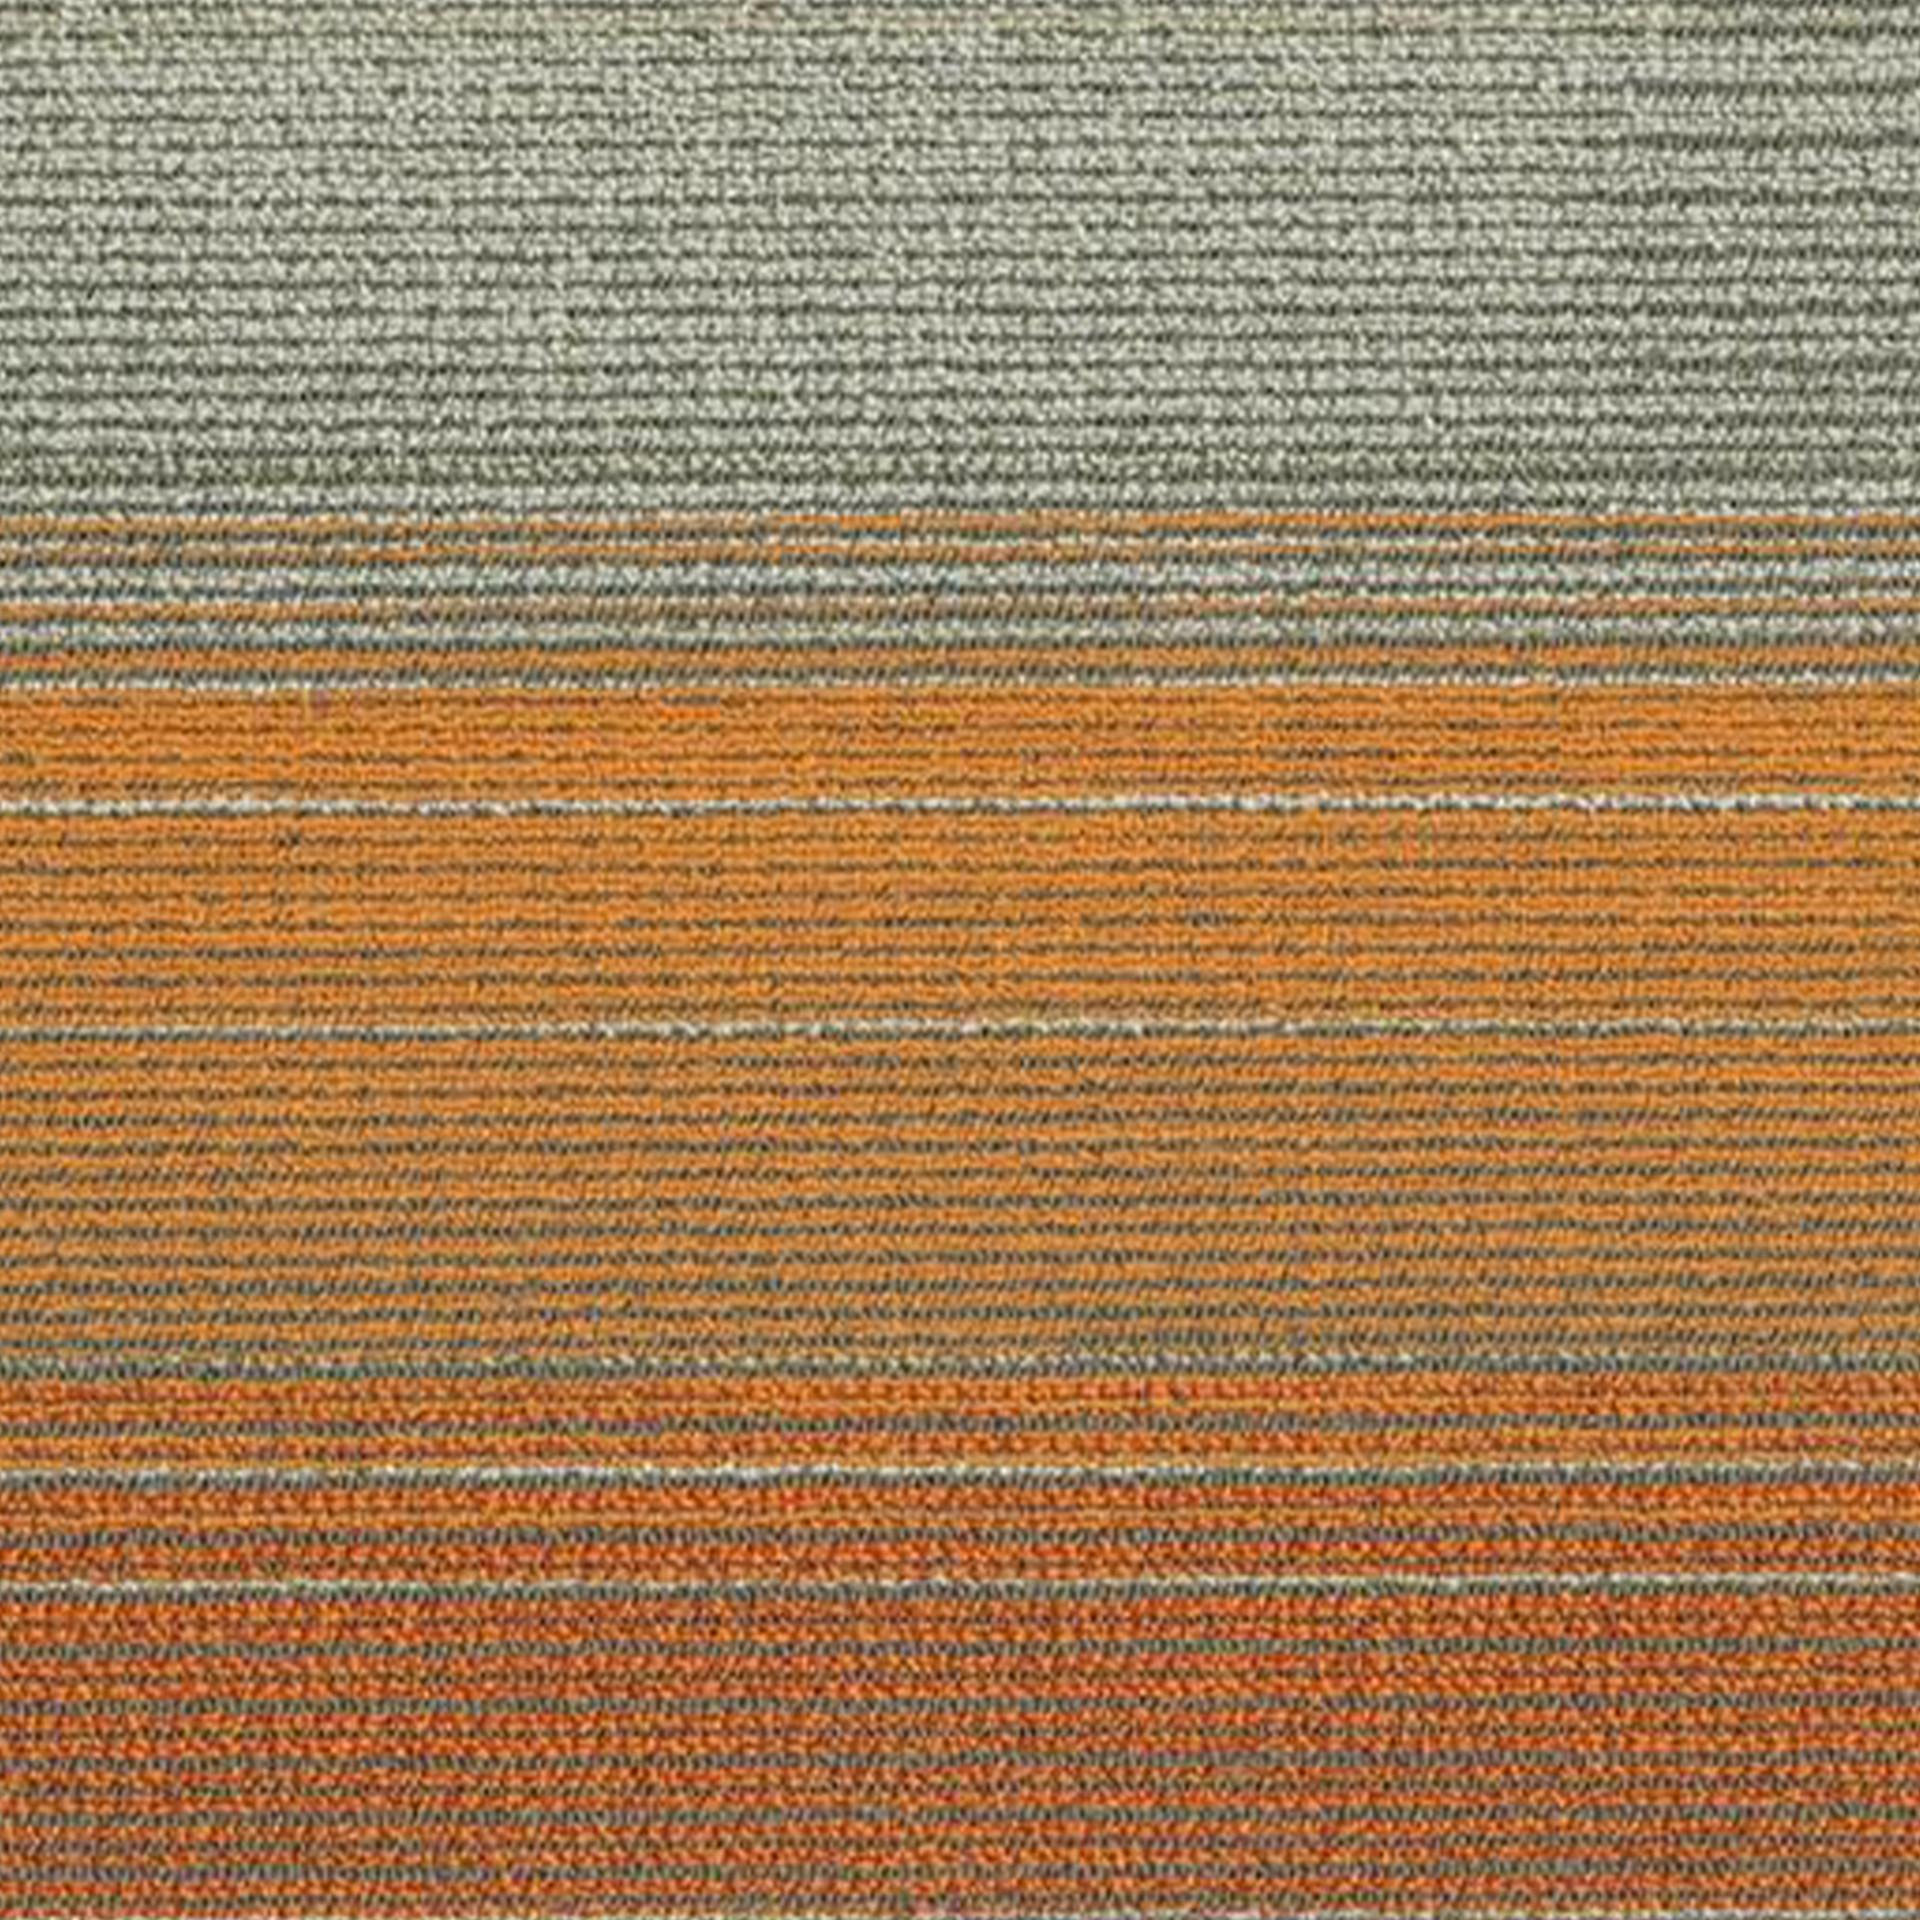 Carpet_1.jpg